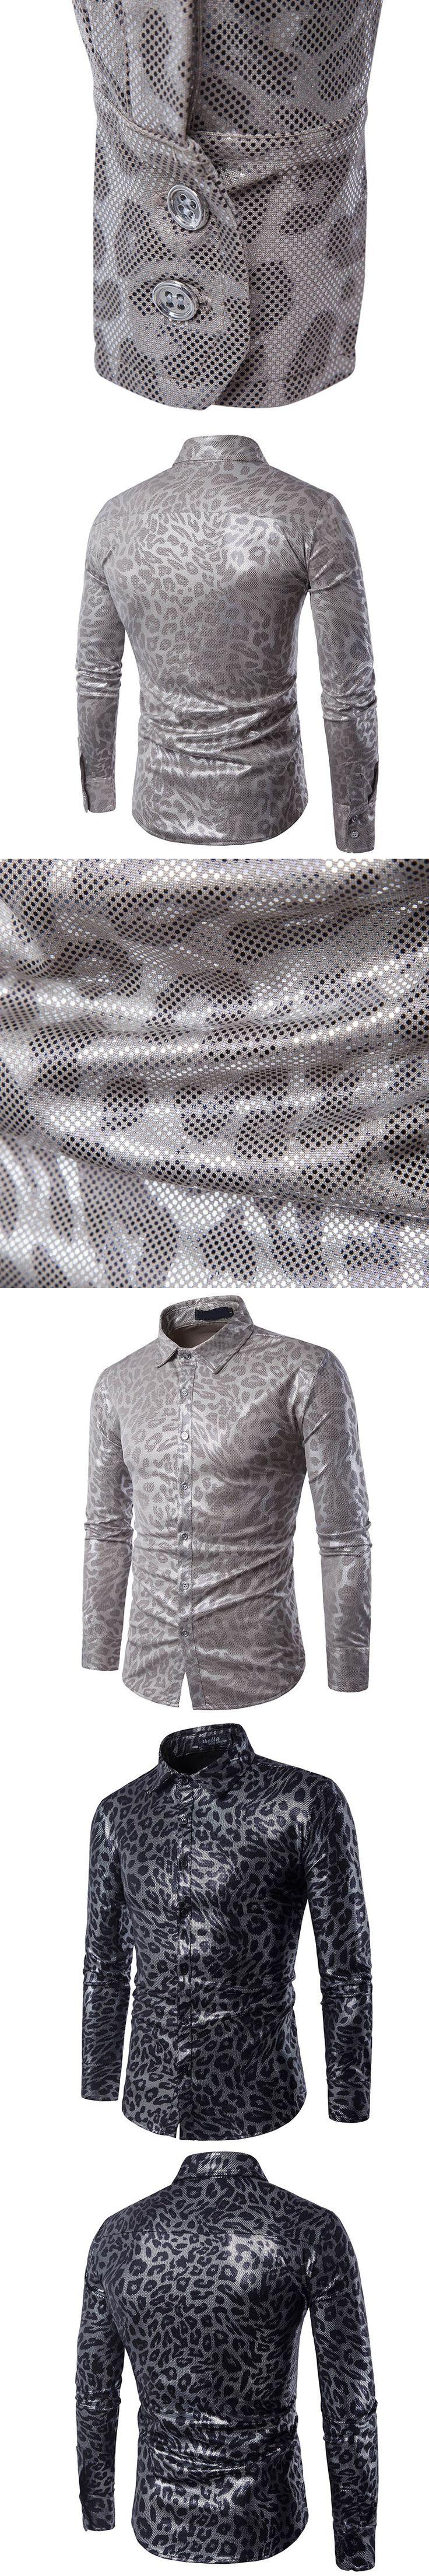 Fashion 2017 fashion casual snake design shirt men Breathable mesh long sleeves city camisa social masculina night club shirt